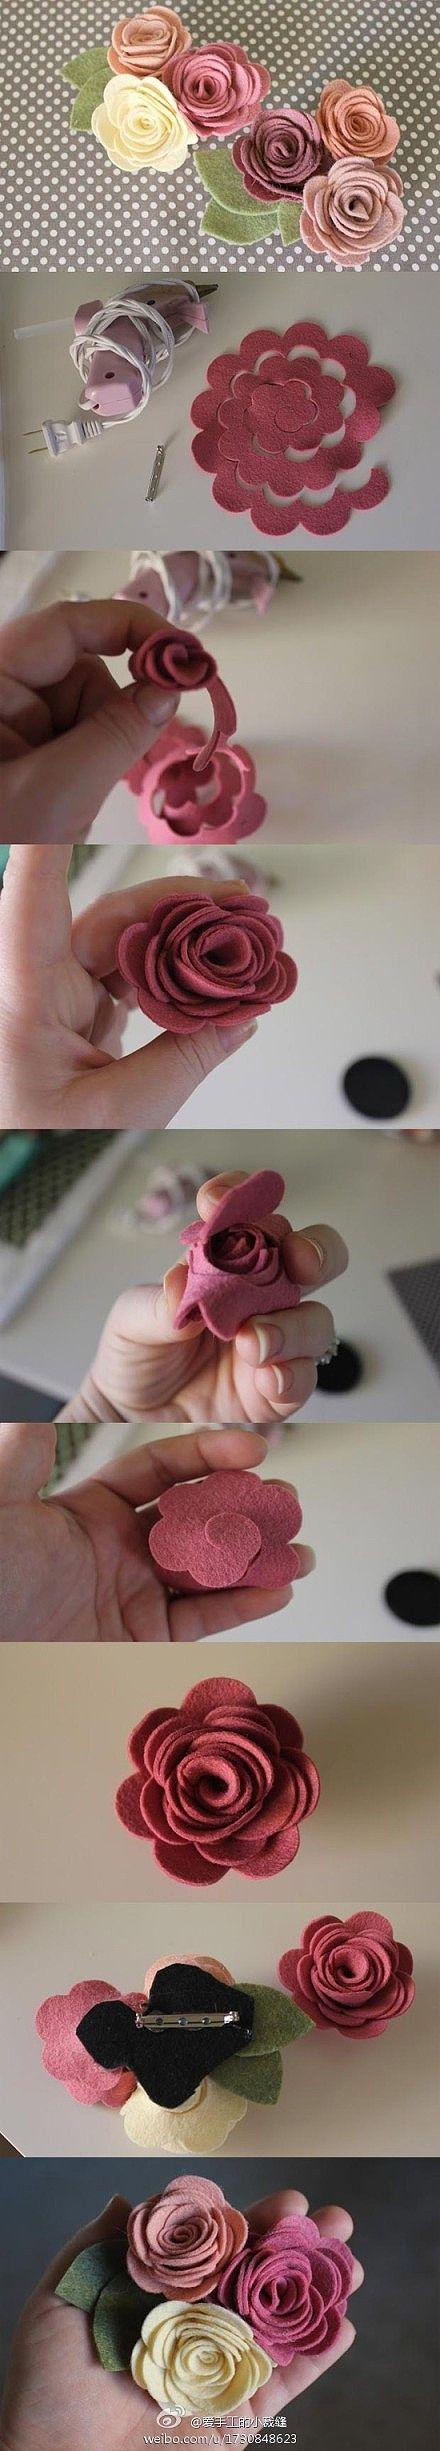 Tutorial fai da te # # handmade fiori